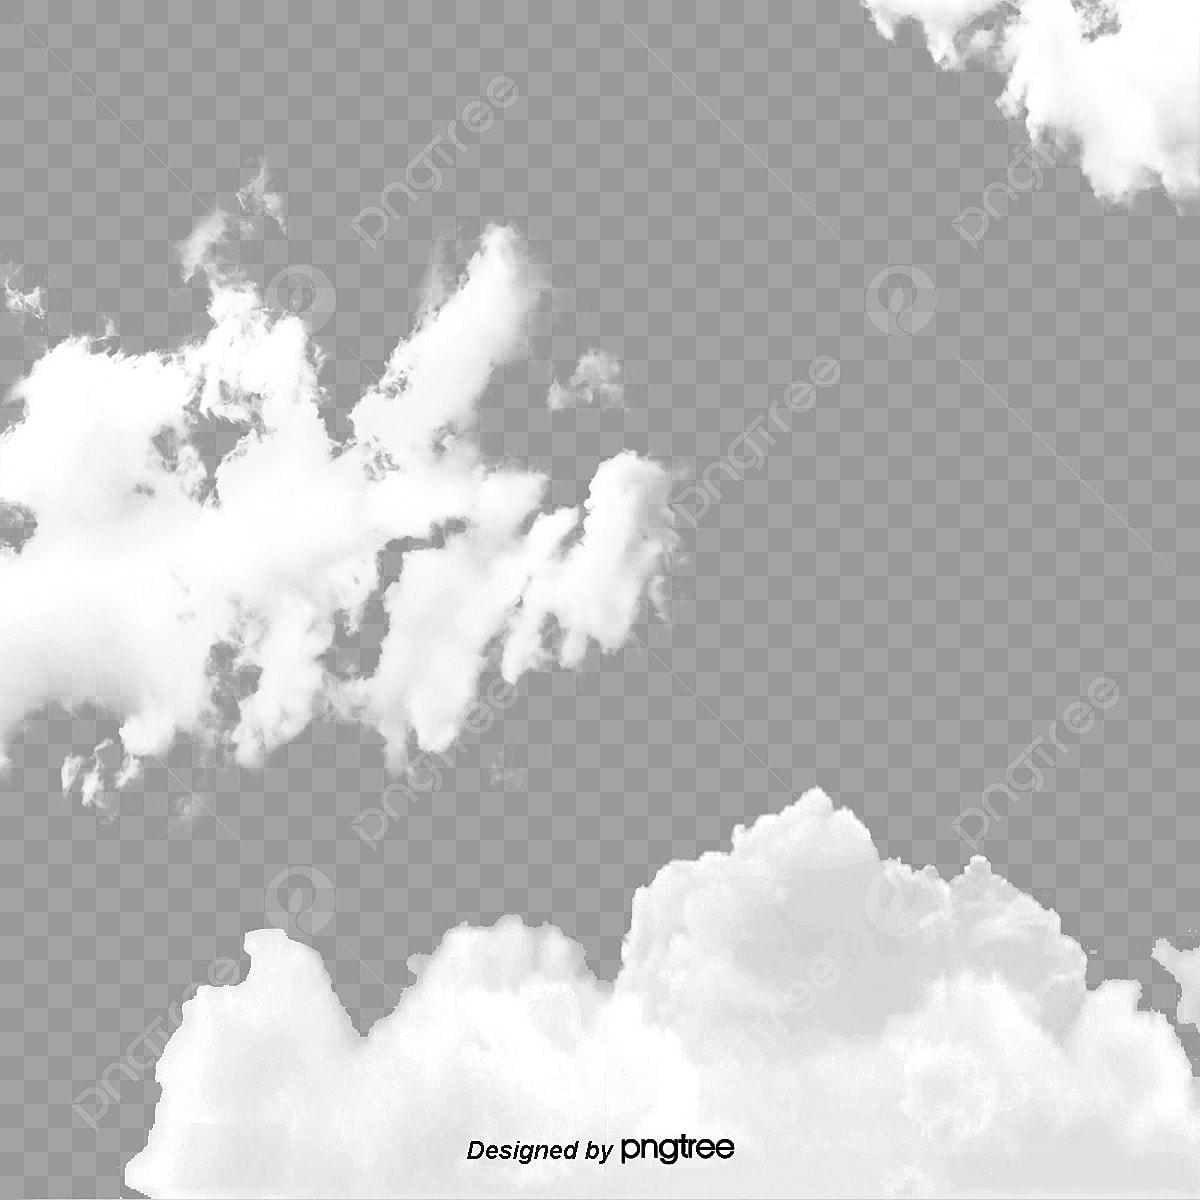 gambar png awan putih terapung awan gelap awan awan serpihan png dan psd untuk muat turun percuma https ms pngtree com freepng floating white cloud png 4170934 html